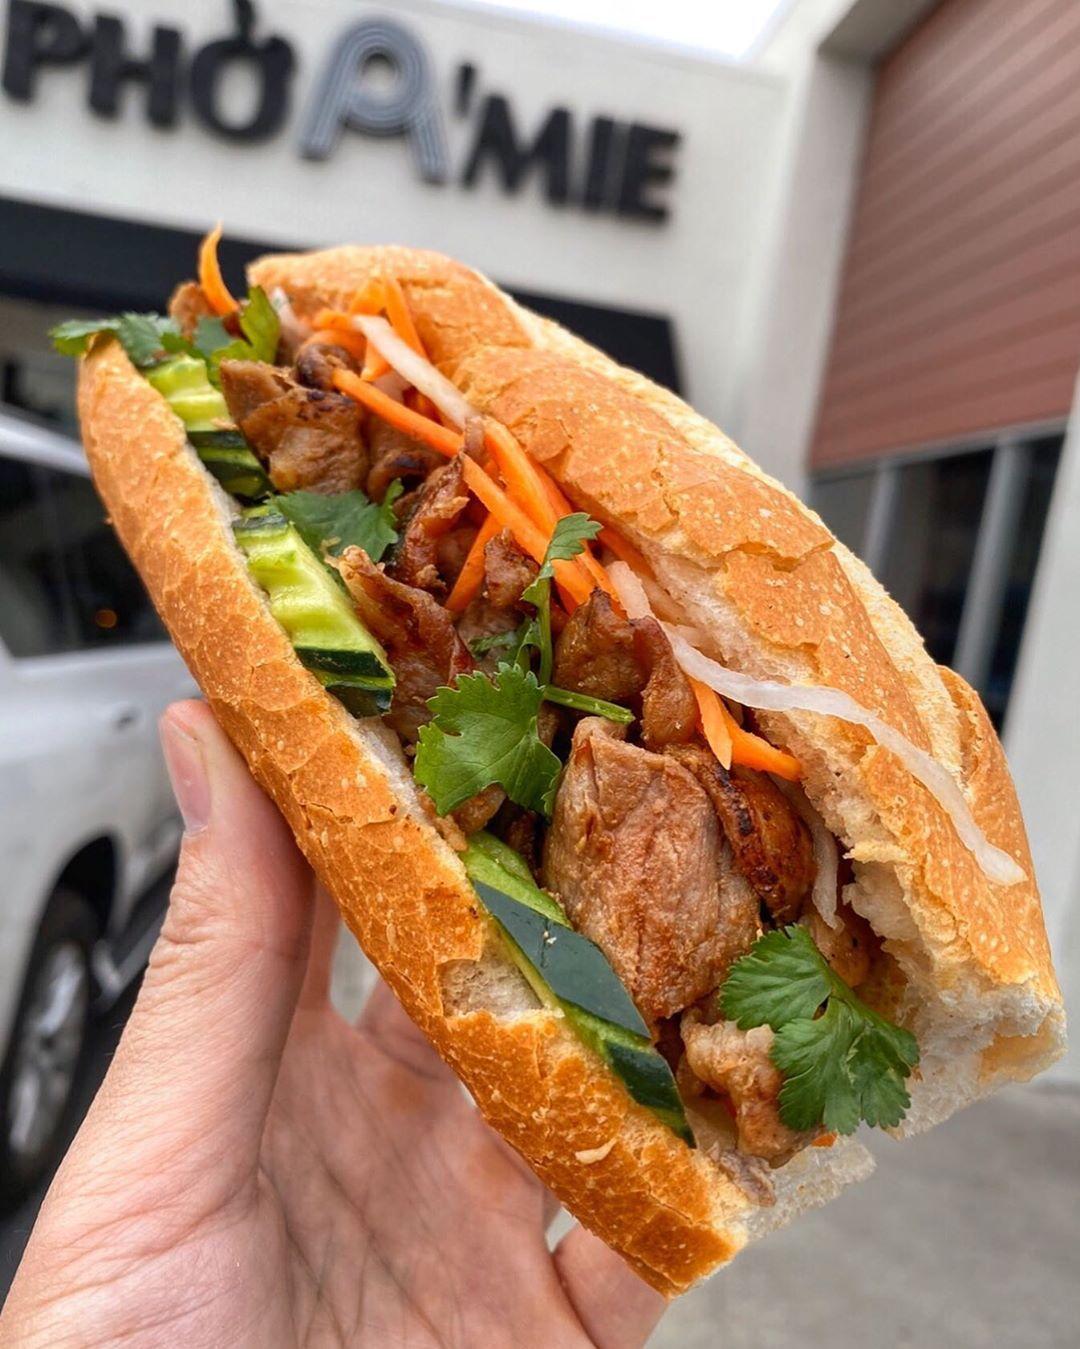 98 Likes, 3 Comments - Pho Amie Vietnamese Cuisine